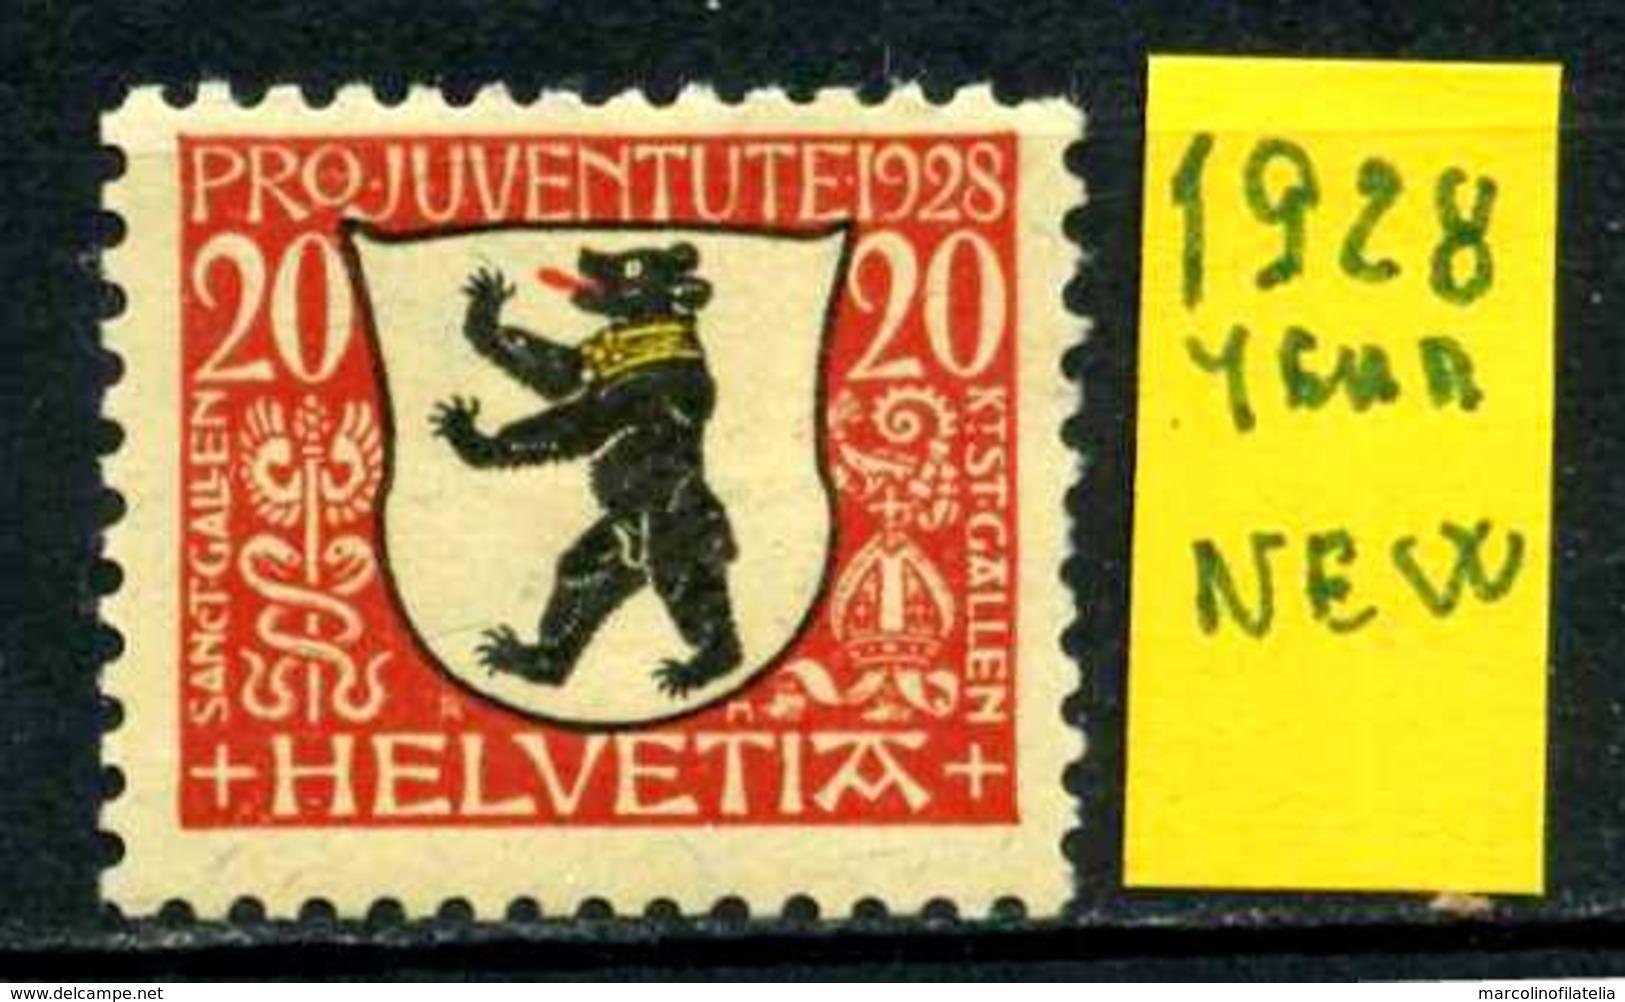 SVIZZERA - HELVETIA - Year 1928 - Nuovo - New - Fraiche - Frisch - MH. - Svizzera